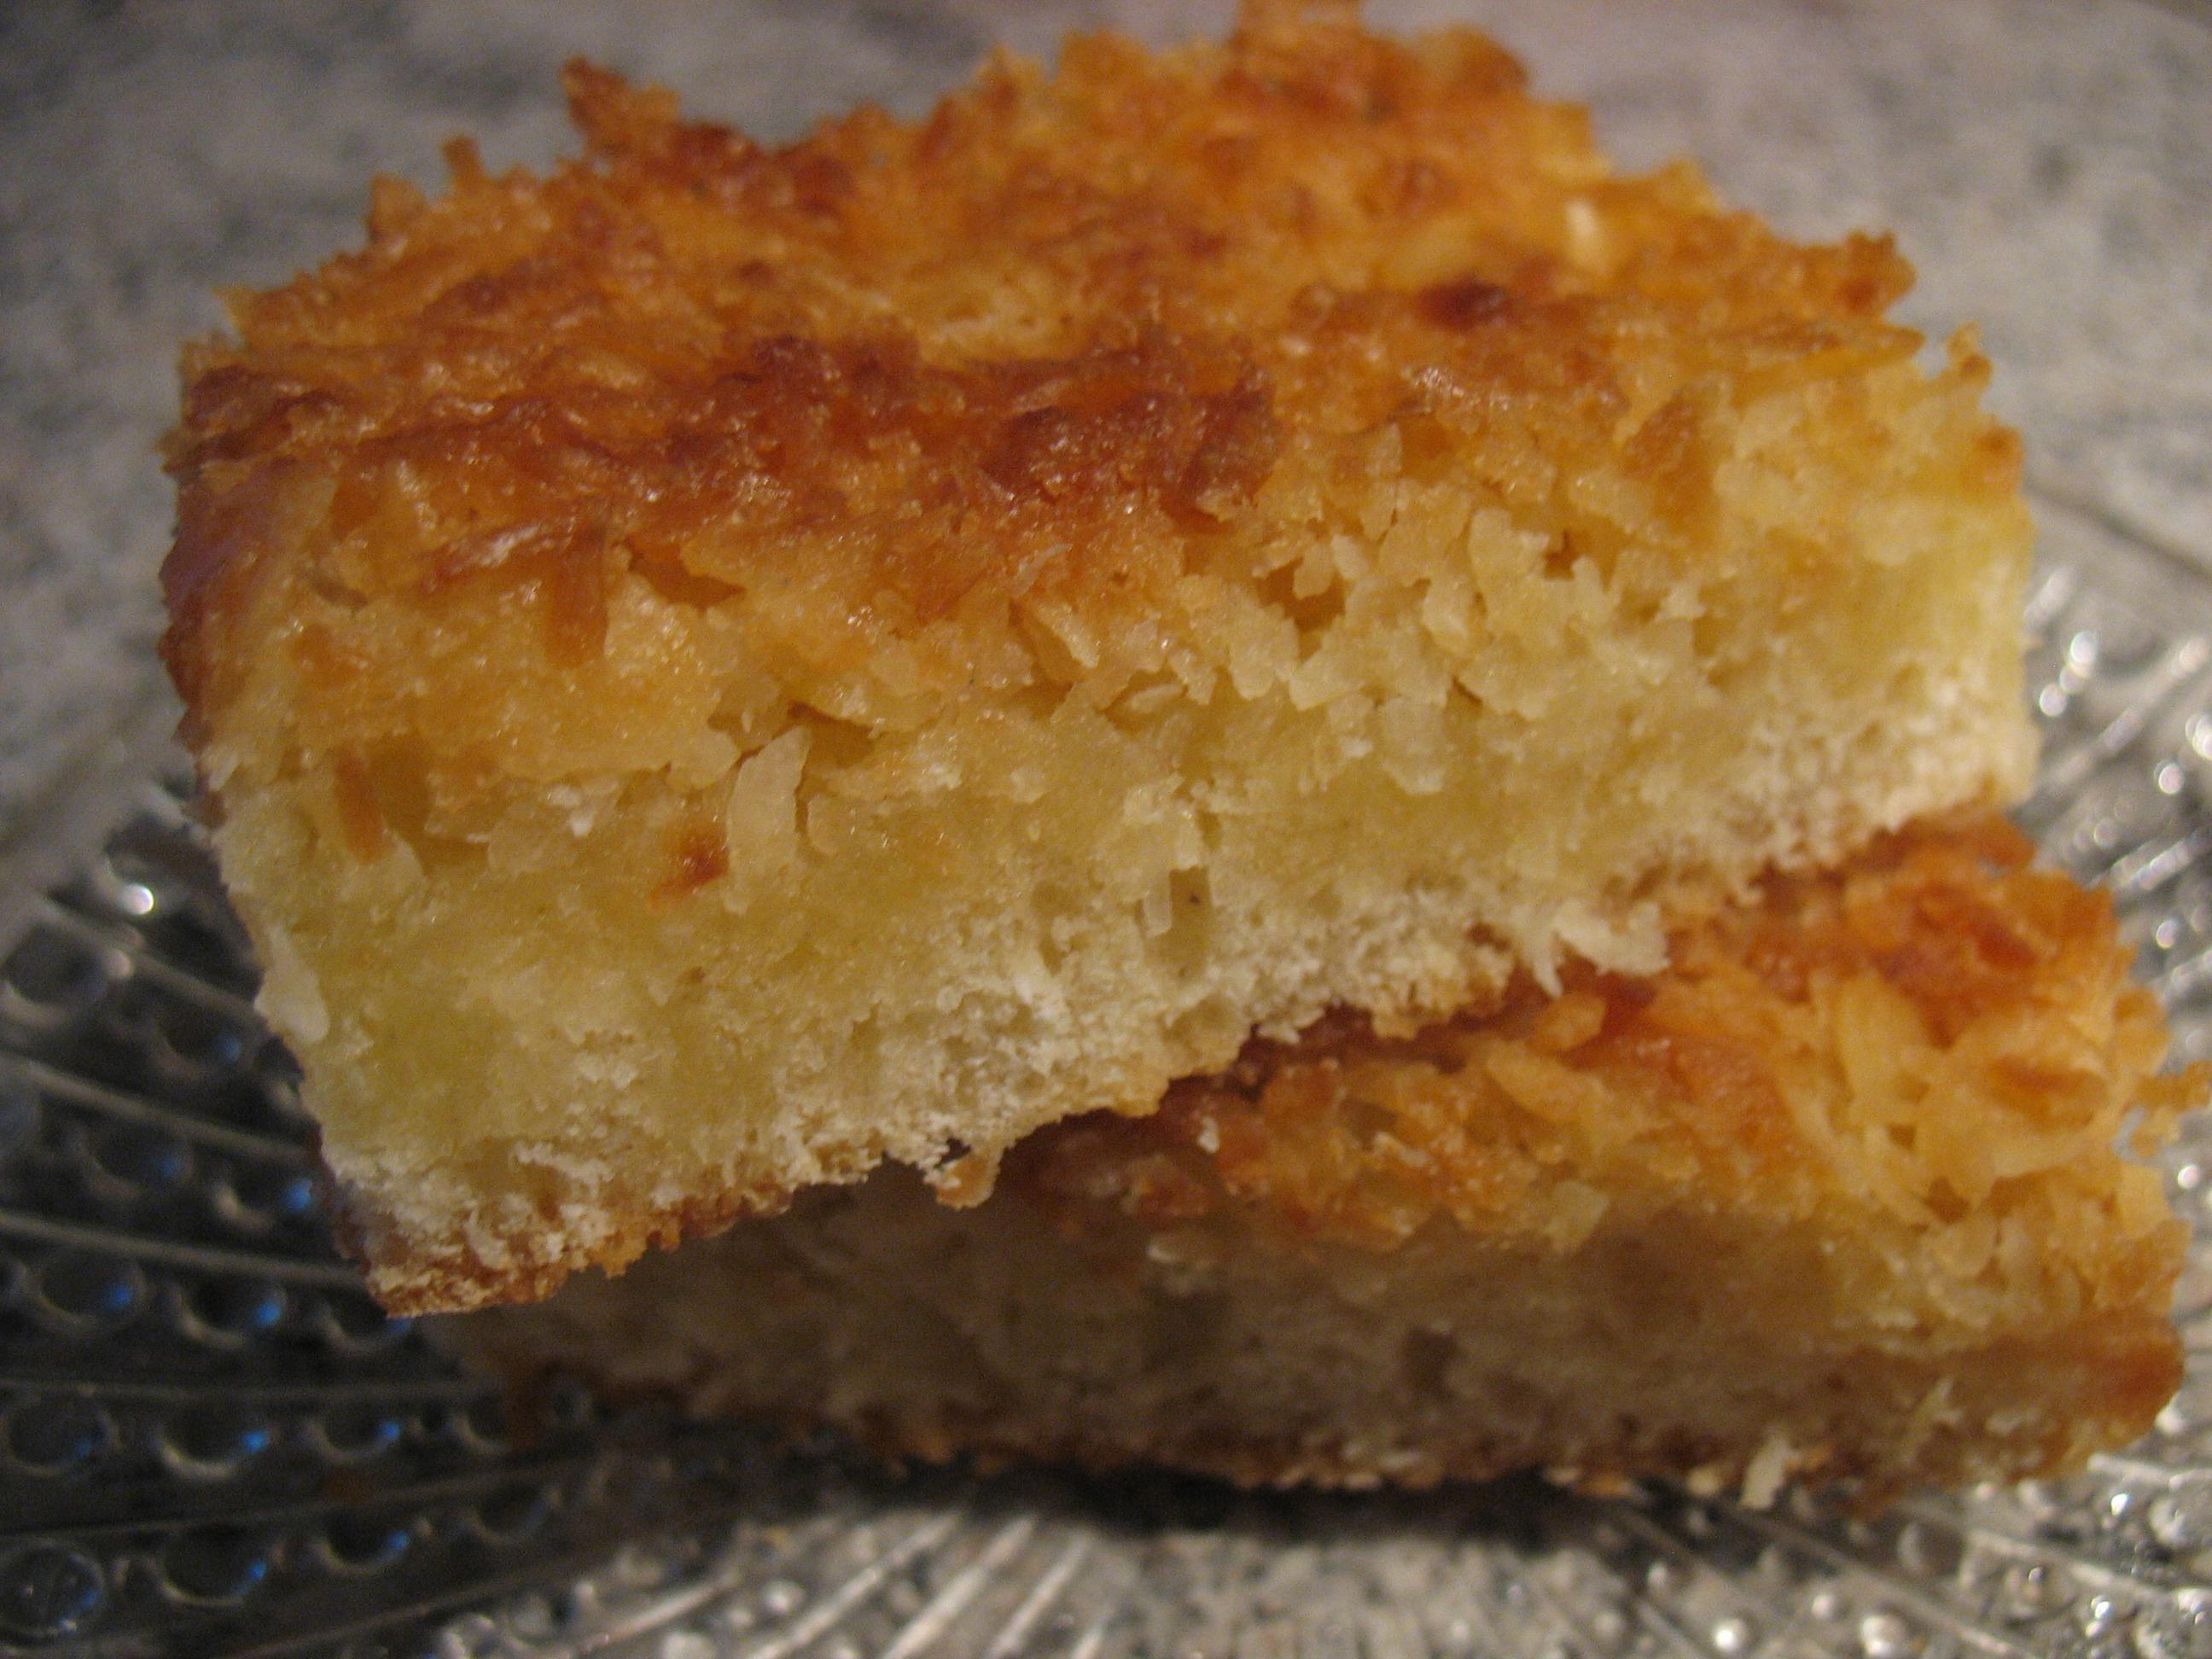 Kokos Bienenstich Blechkuchen Besonders Saftig Rezept Backen